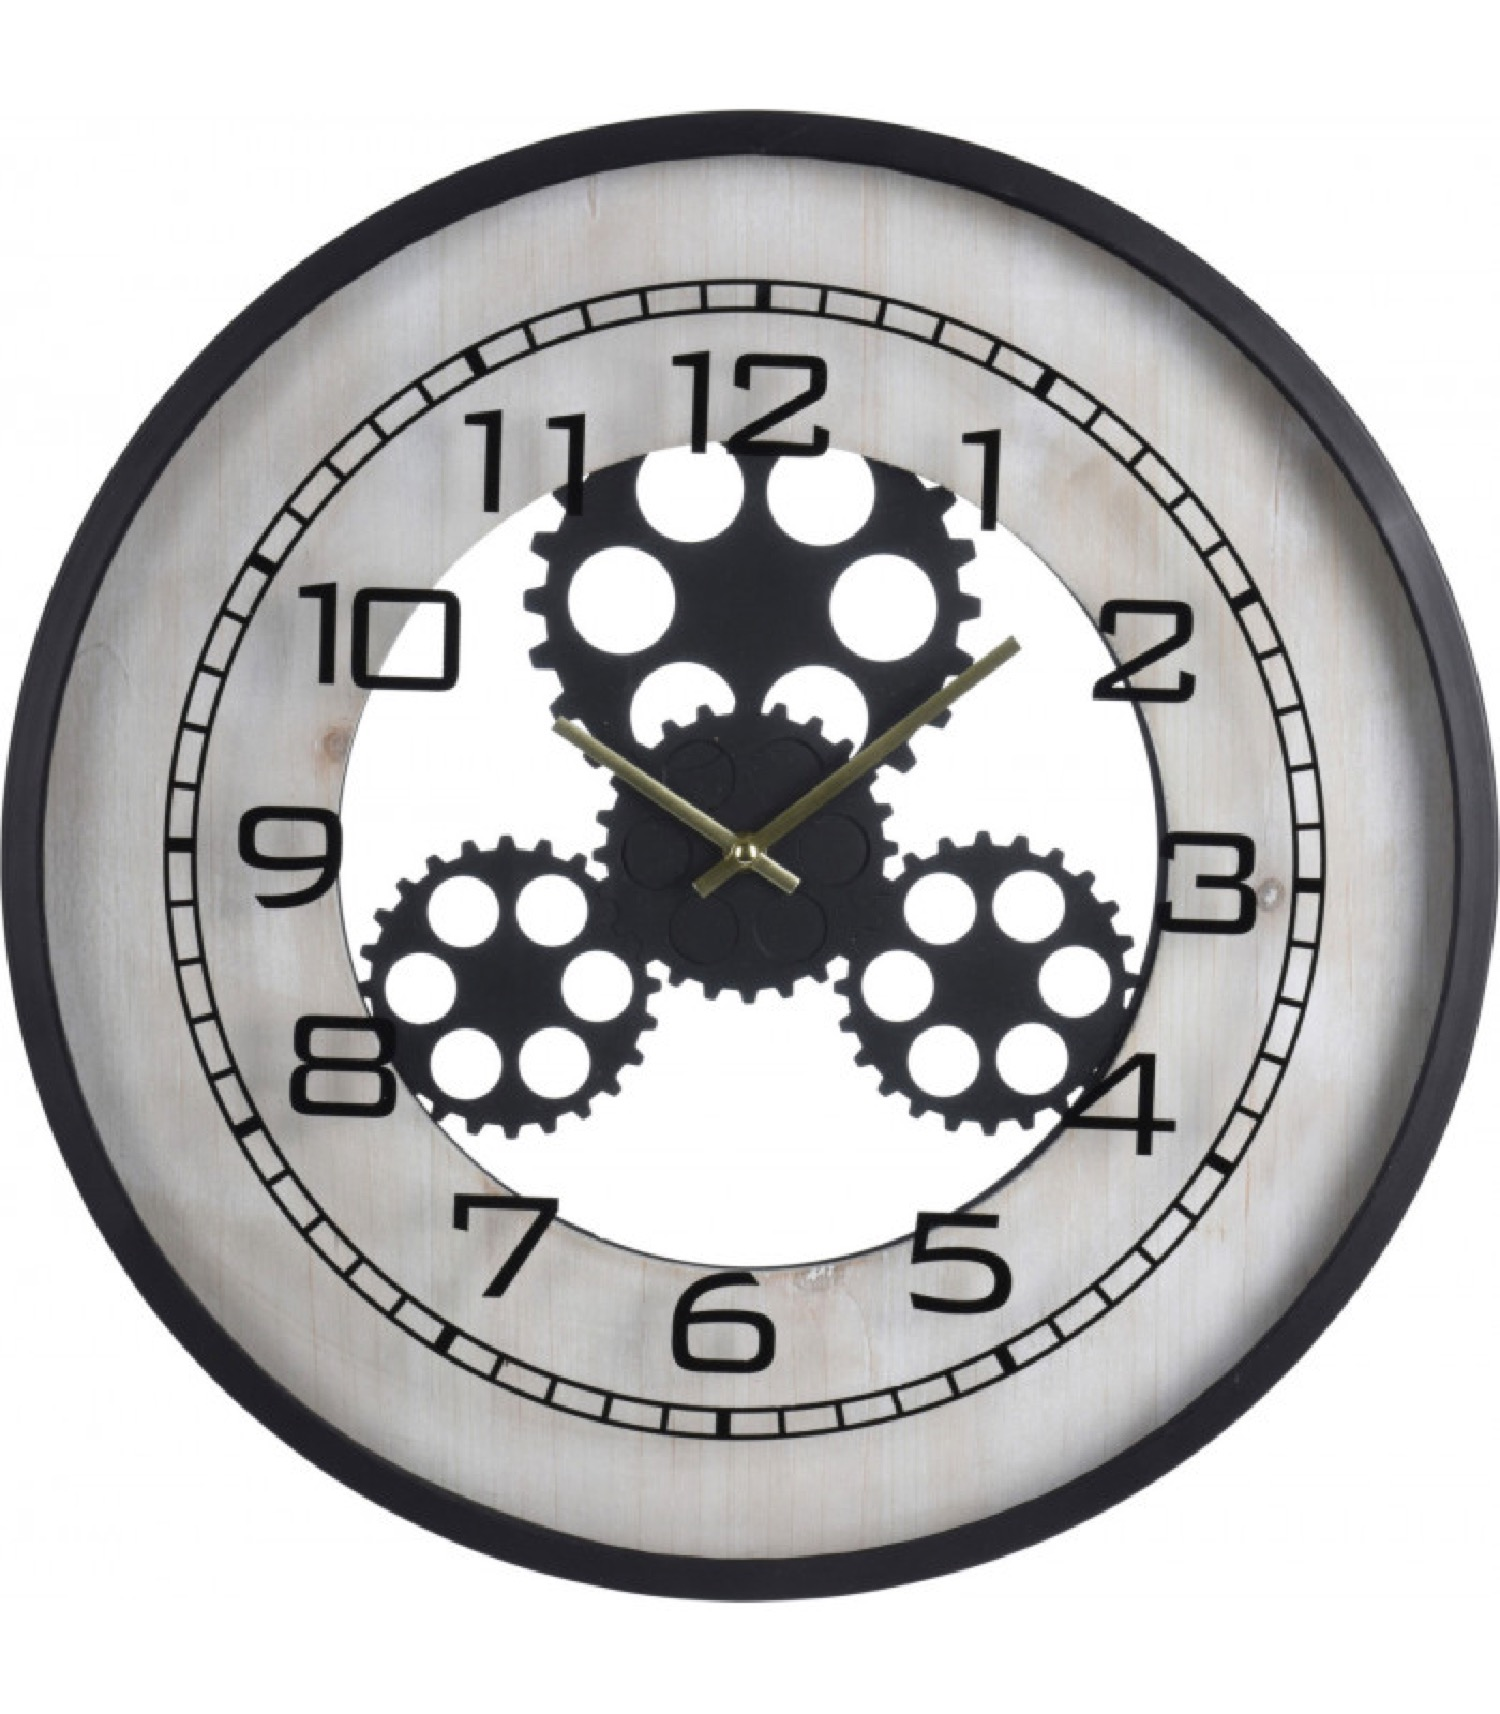 Horloge murale ronde en métal engrenages D48